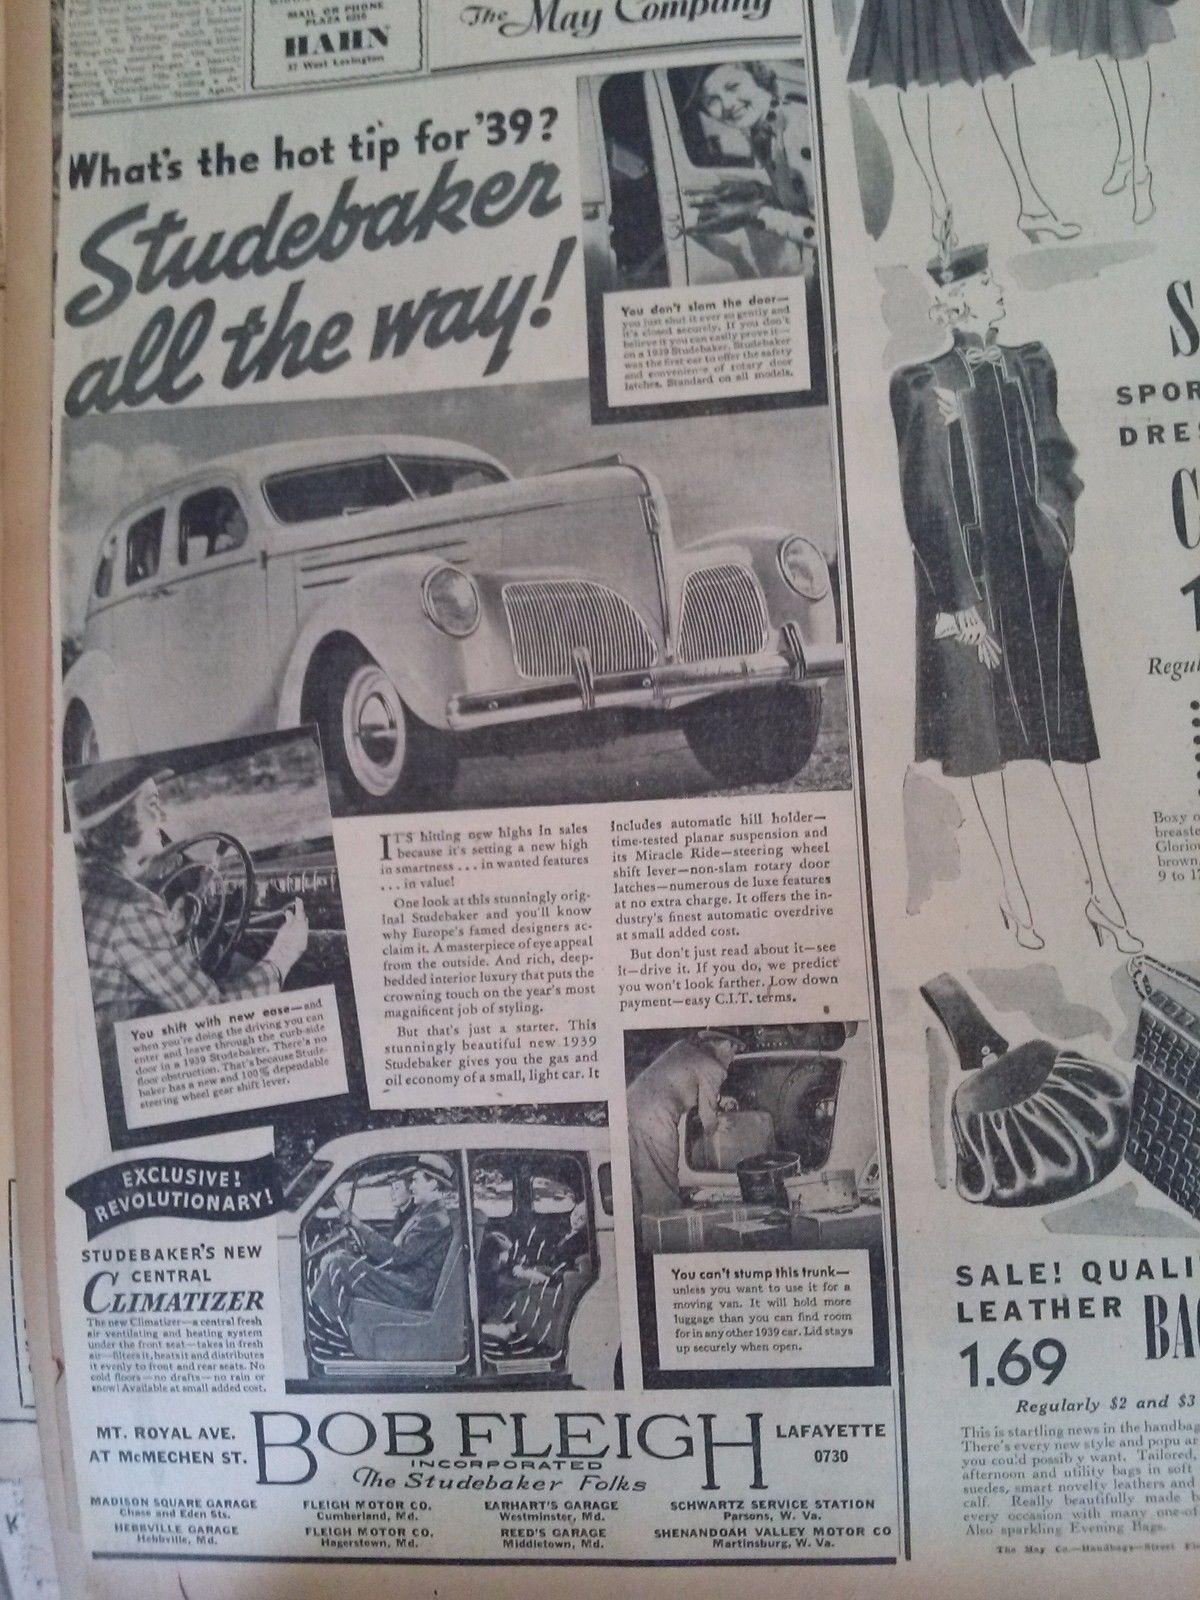 Major Motors Baltimore Newletterjdi Co